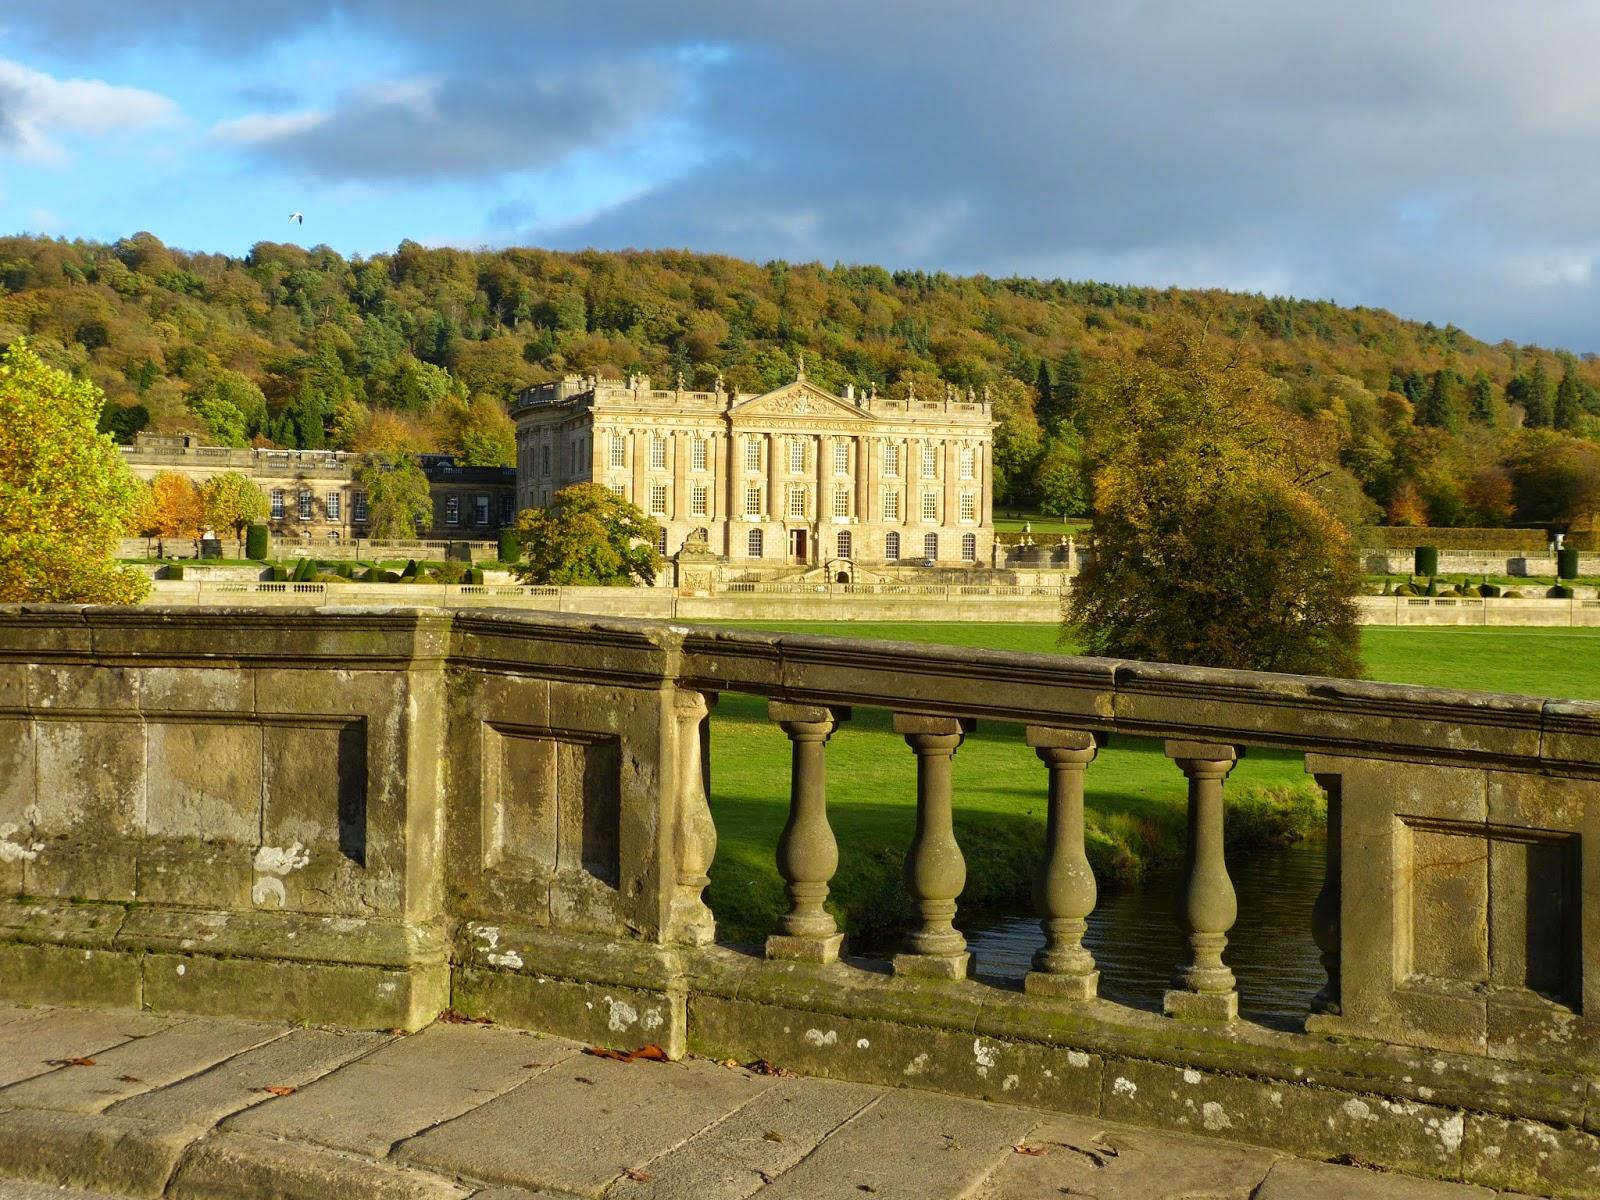 Chatsworth from the stone bridge